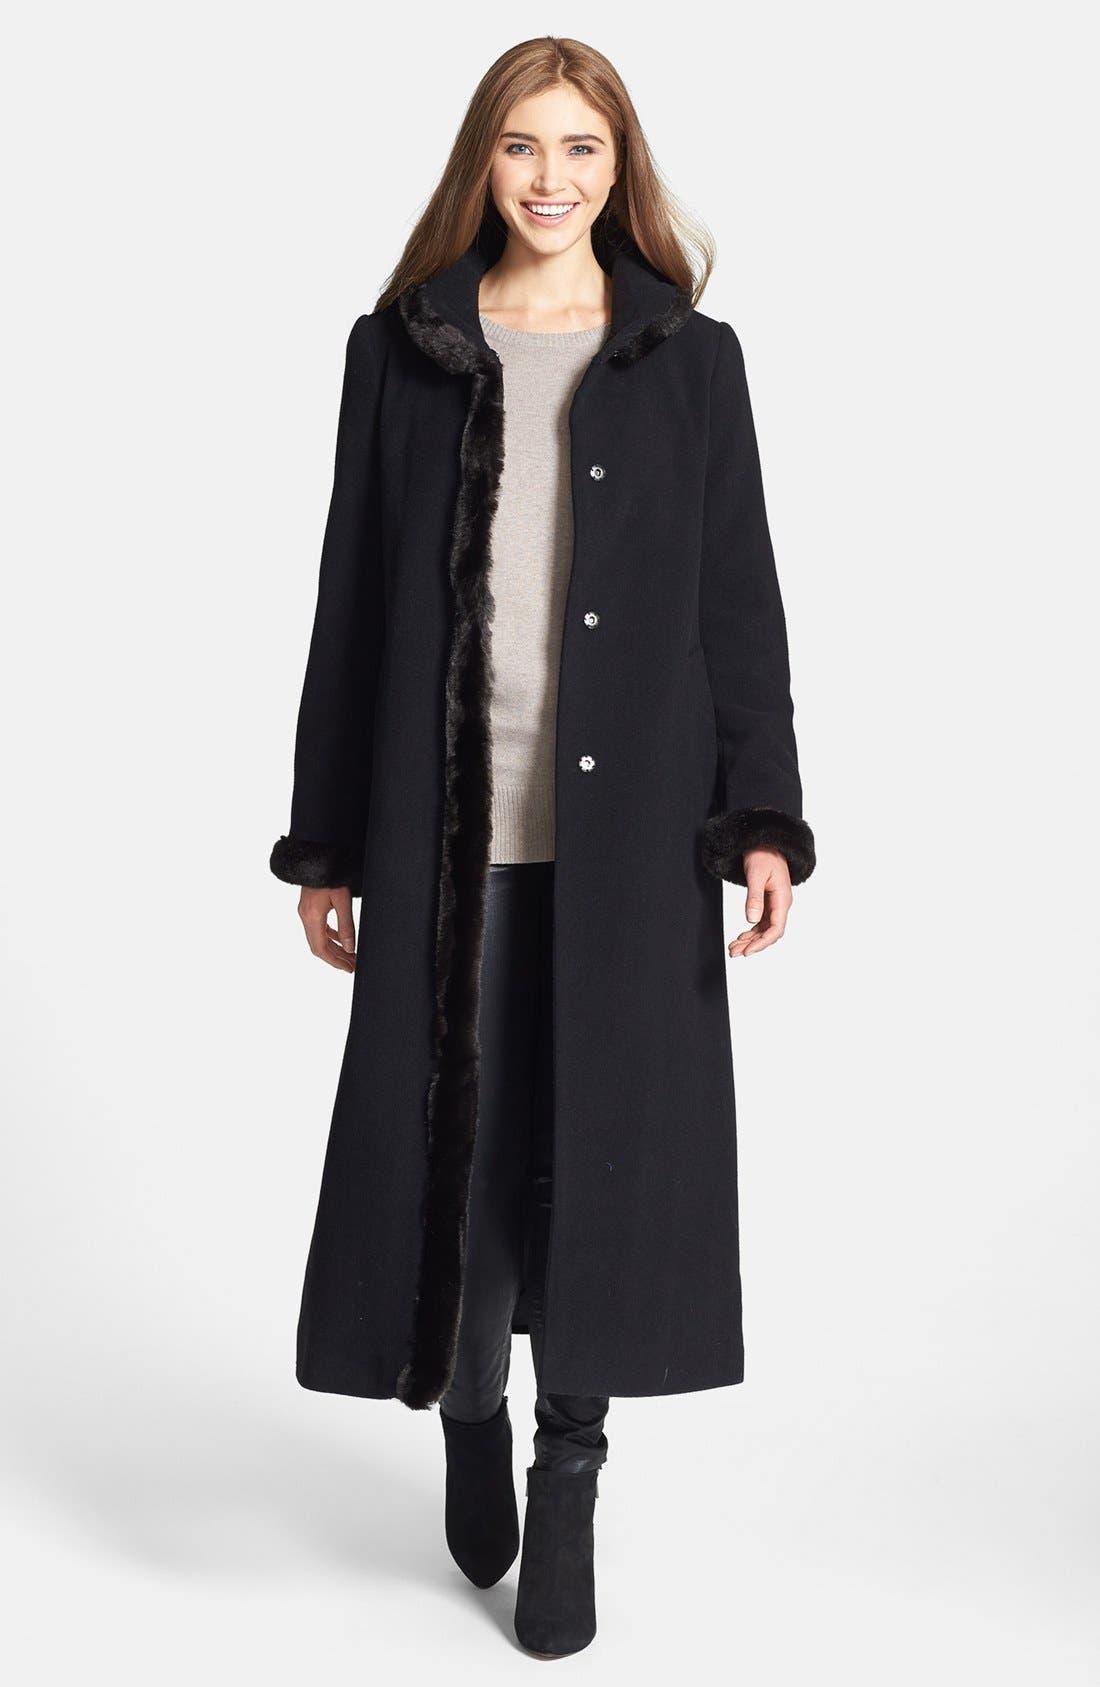 Alternate Image 1 Selected - Ellen Tracy Faux Fur Trim Long Wool Blend Coat